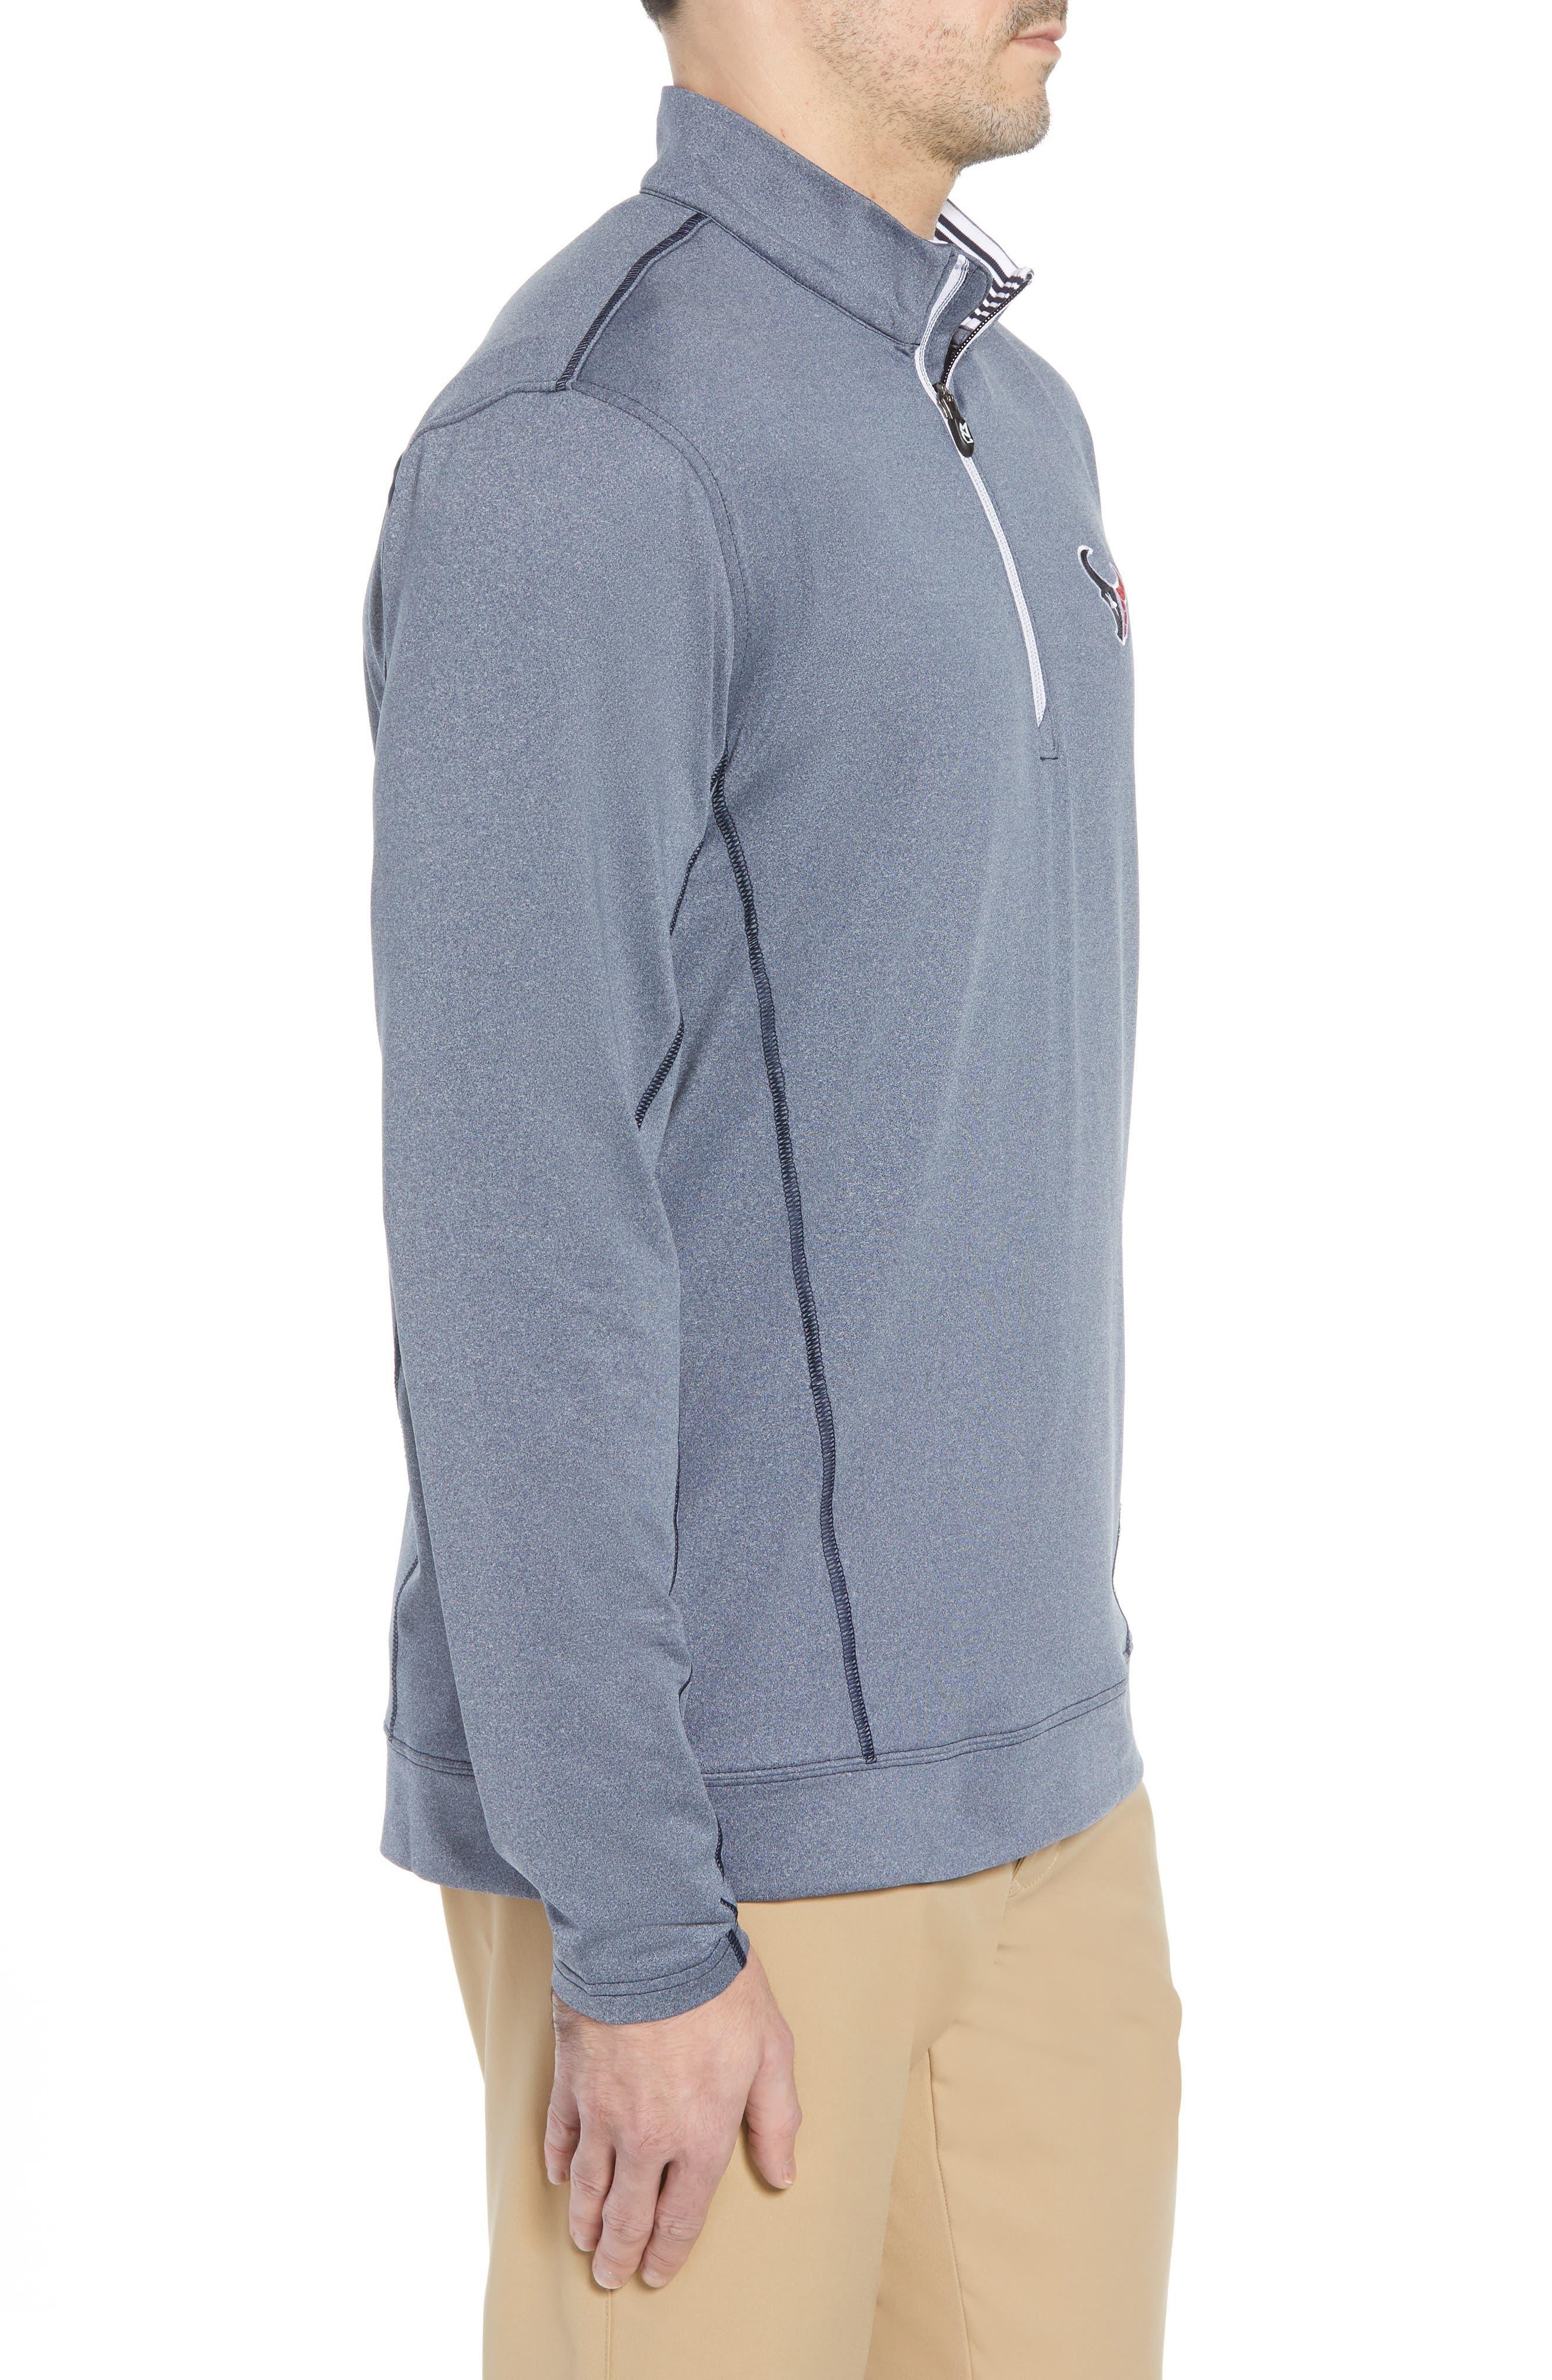 Endurance Houston Texans Regular Fit Pullover,                             Alternate thumbnail 3, color,                             LIBERTY NAVY HEATHER